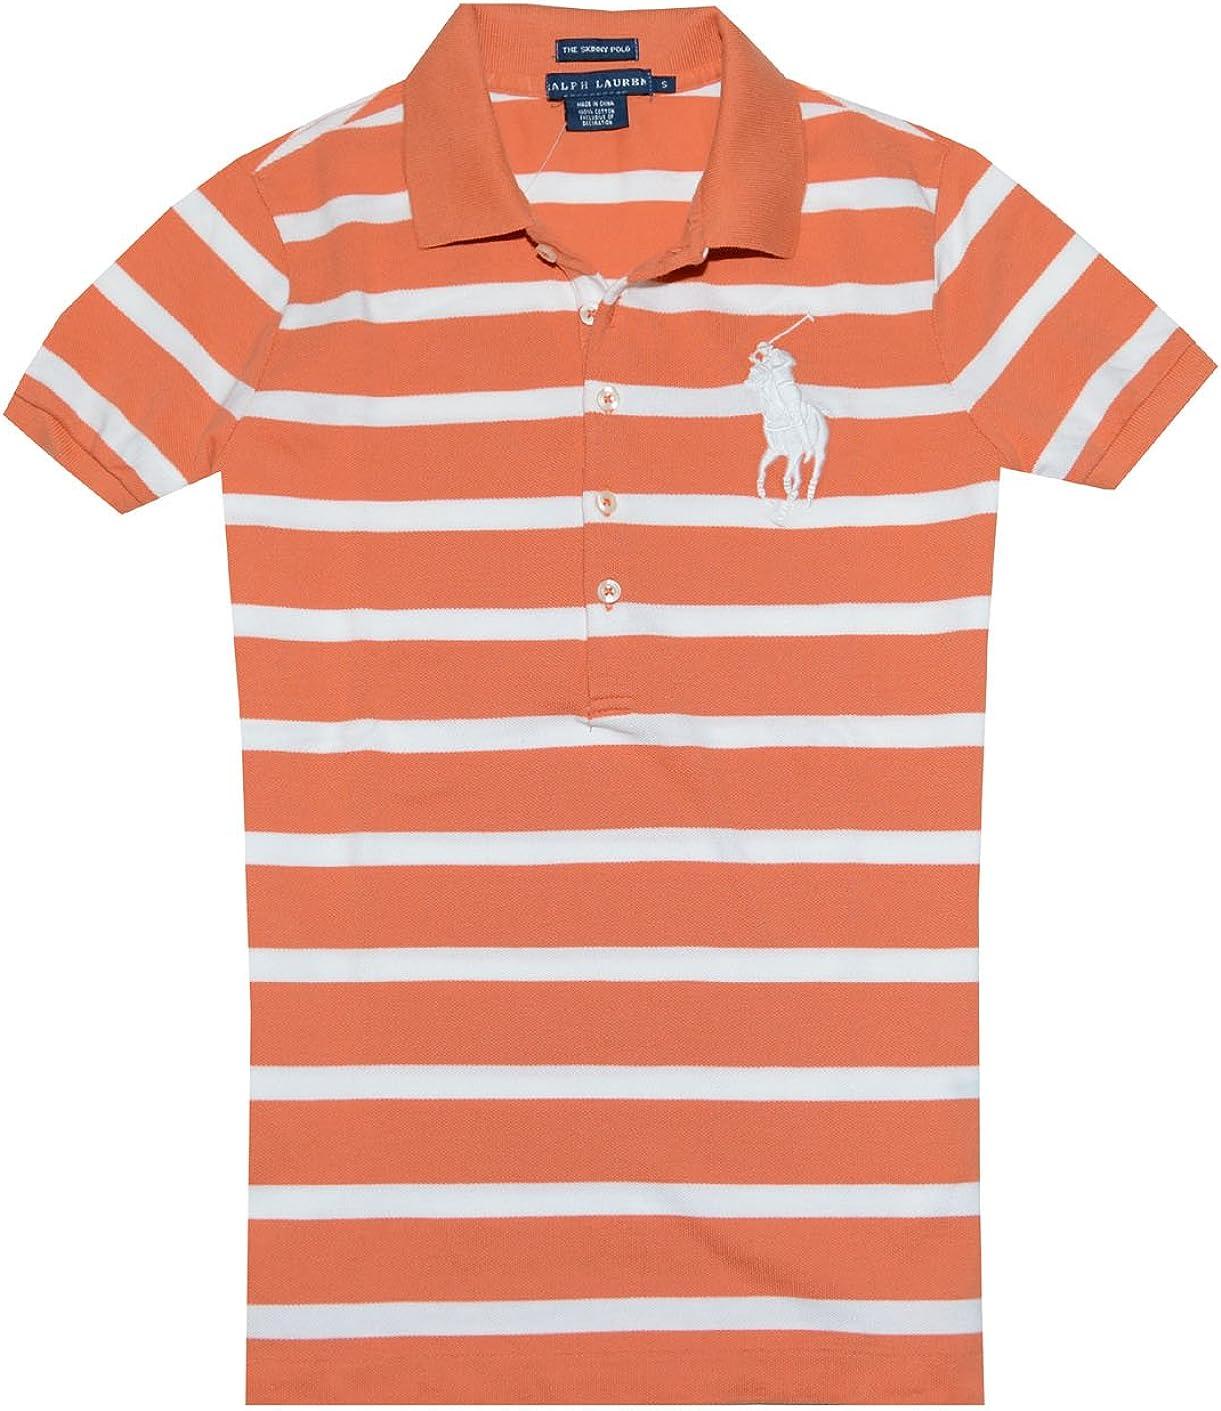 Ralph Lauren Polo Skinny Womens Big Pony Short Sleeve Shirt Orange